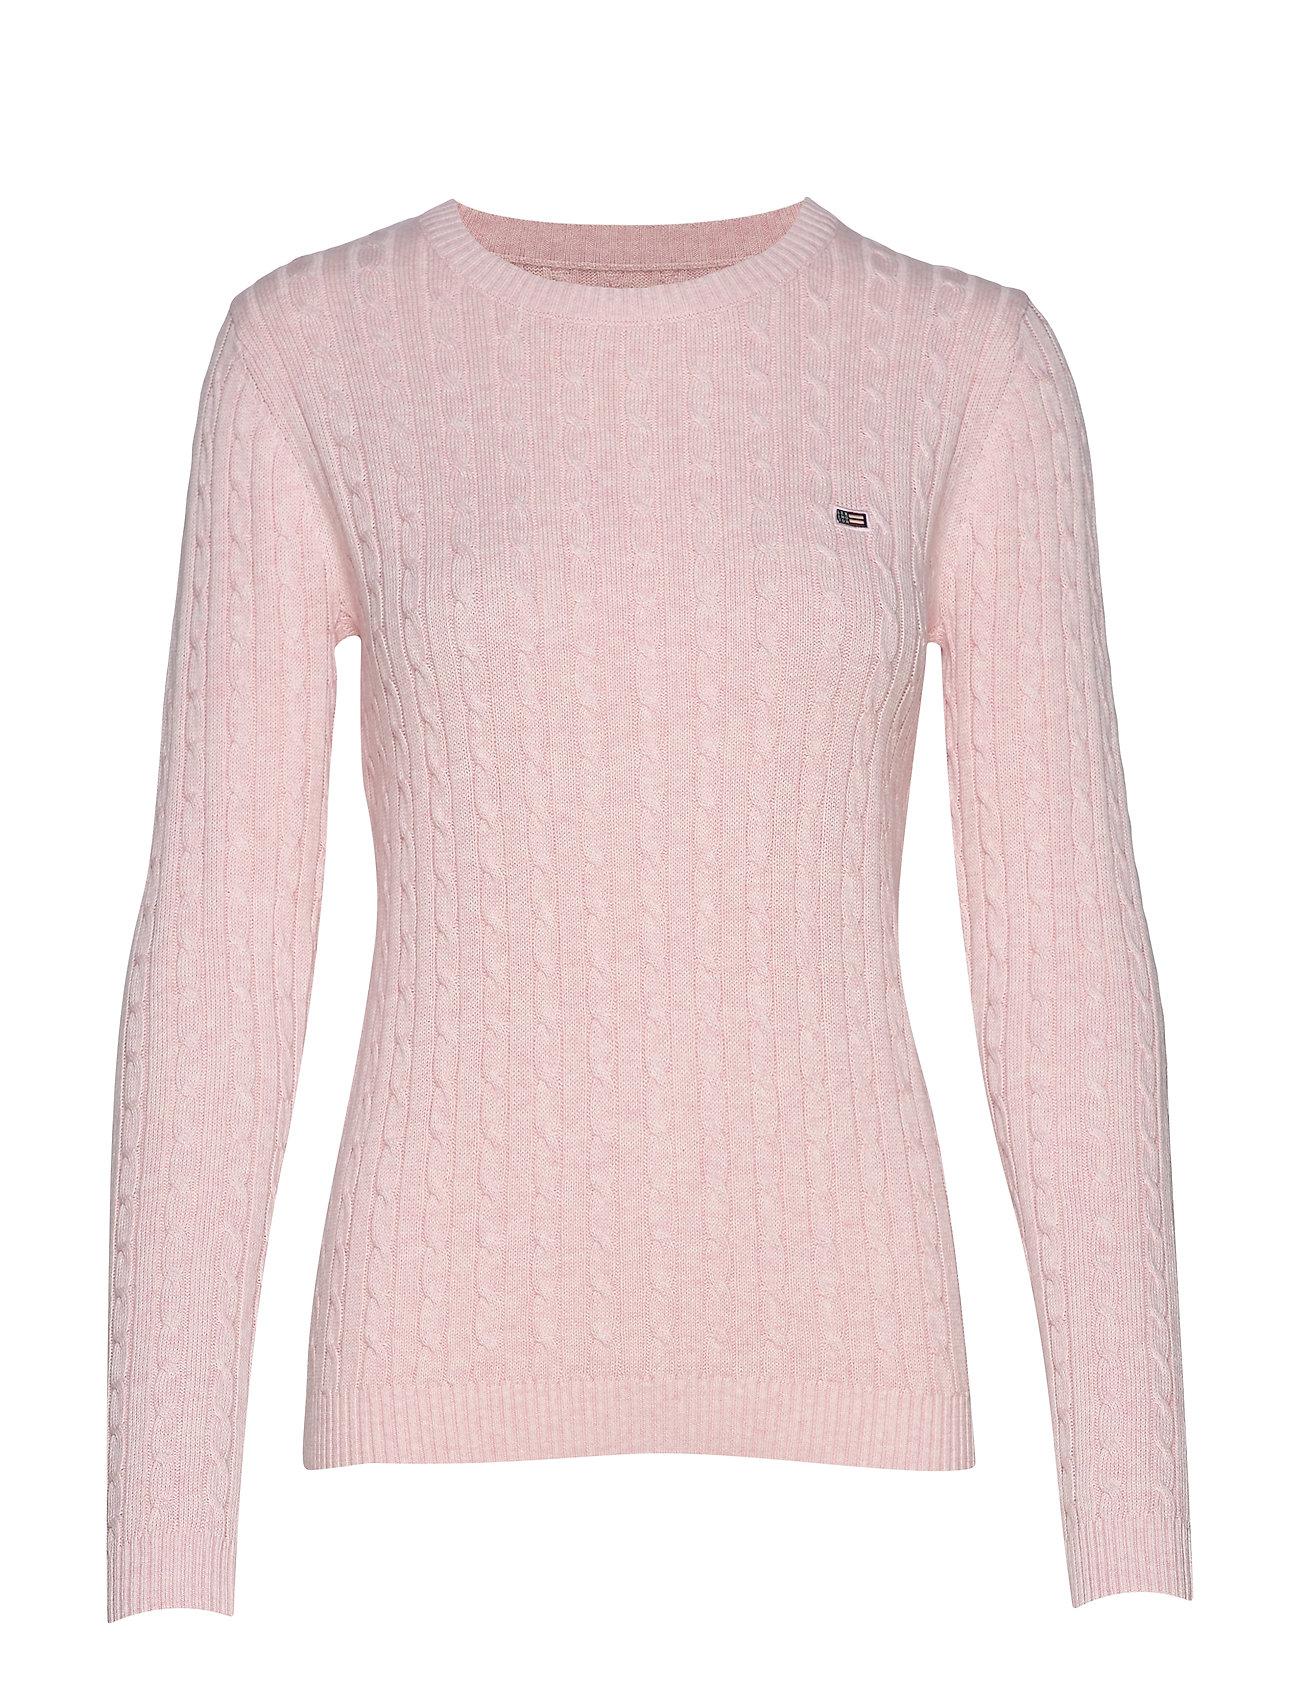 Lexington Clothing Felizia Cable Sweater - PINK MELANGE